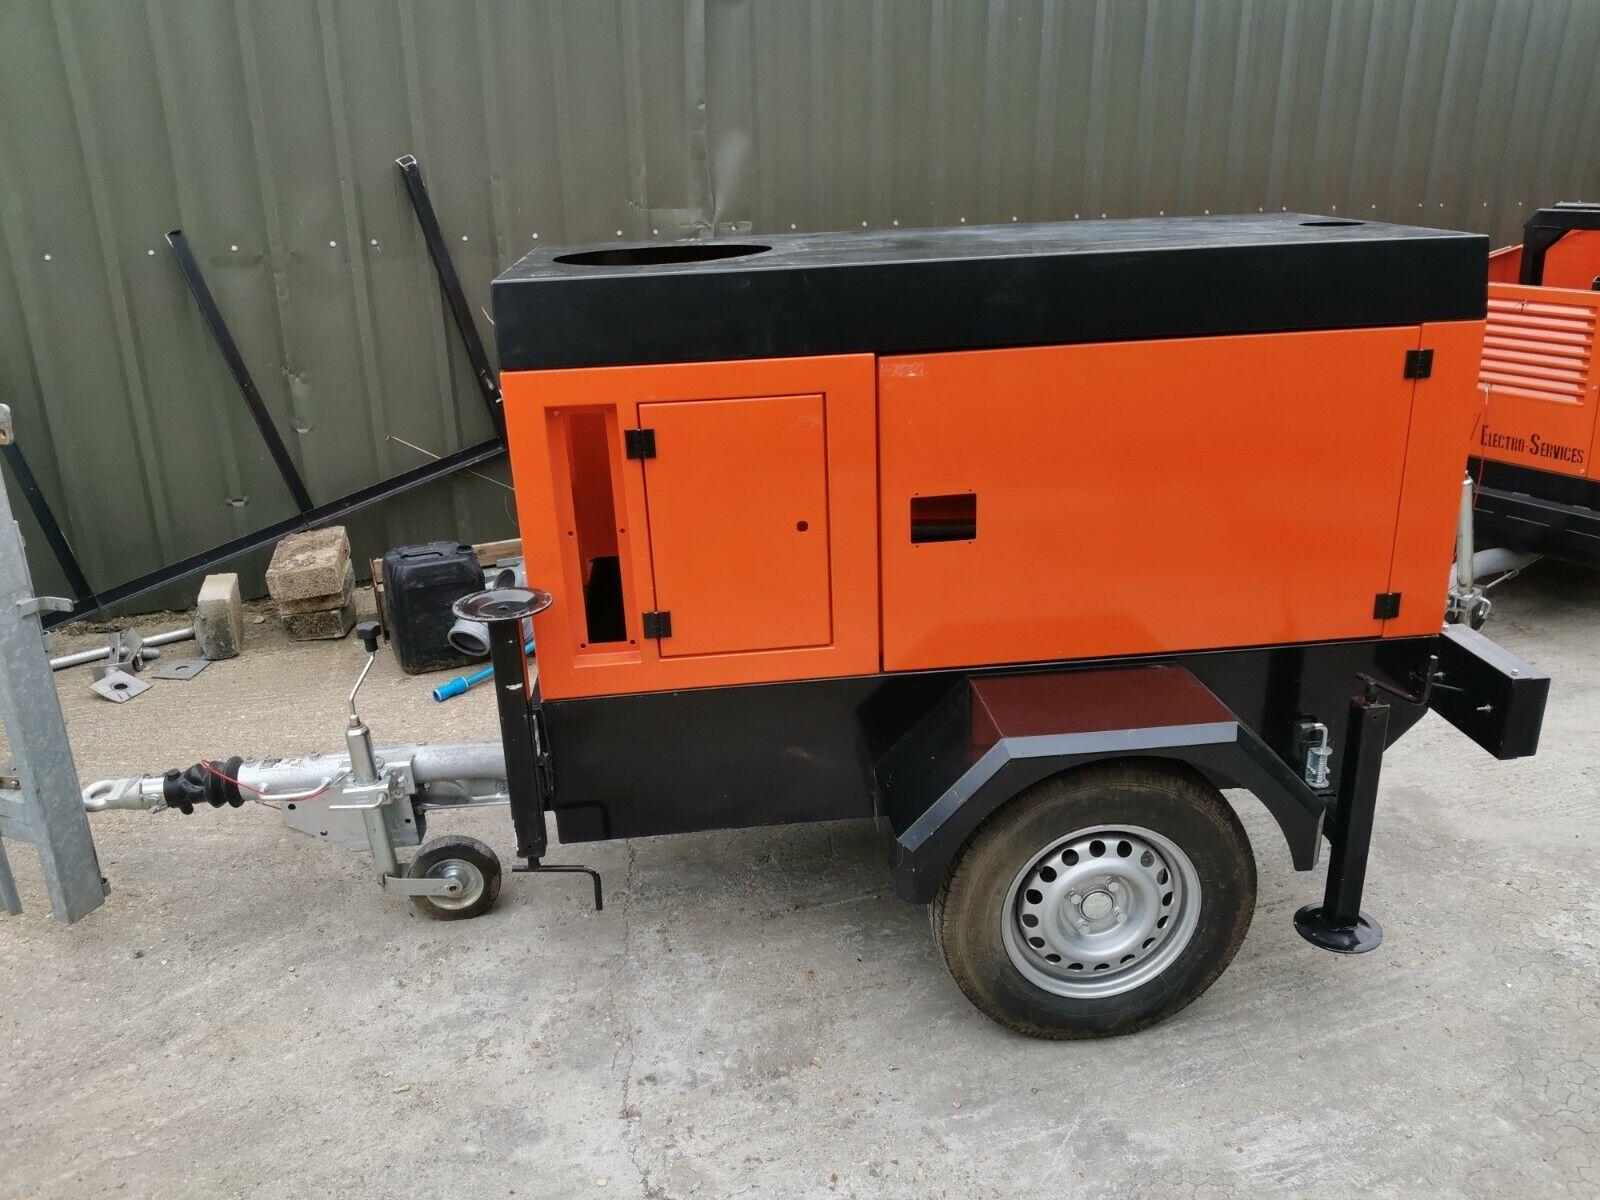 1350Kg Knott Avonride Generator Trailer Chassis With Enclosure New Build INC VAT